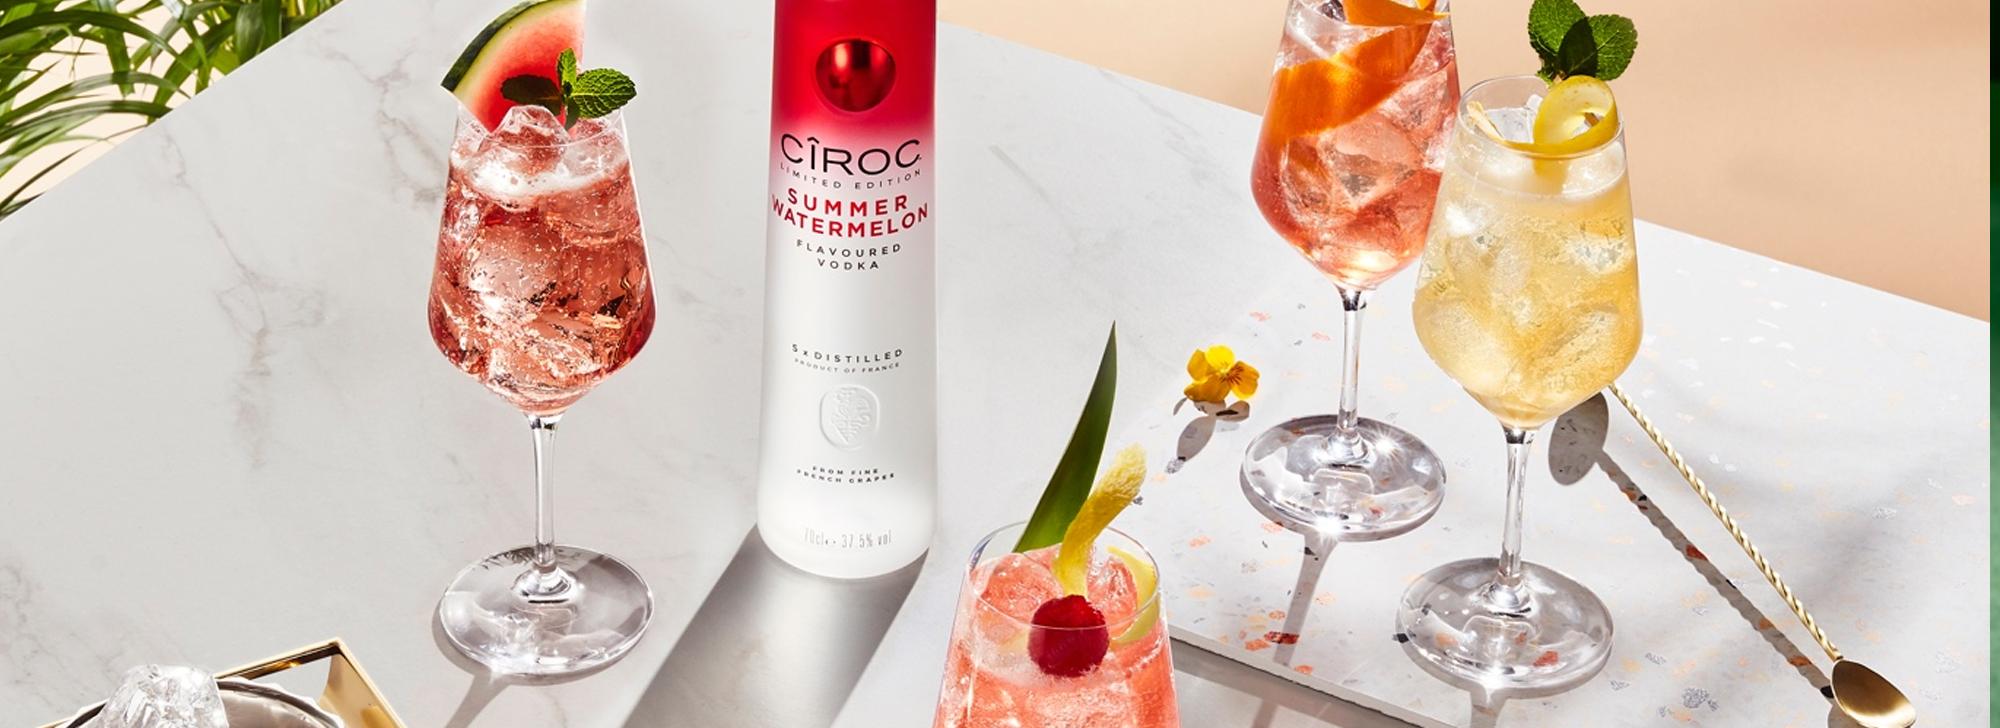 How to Make Cîroc Cocktail Recipes at Home